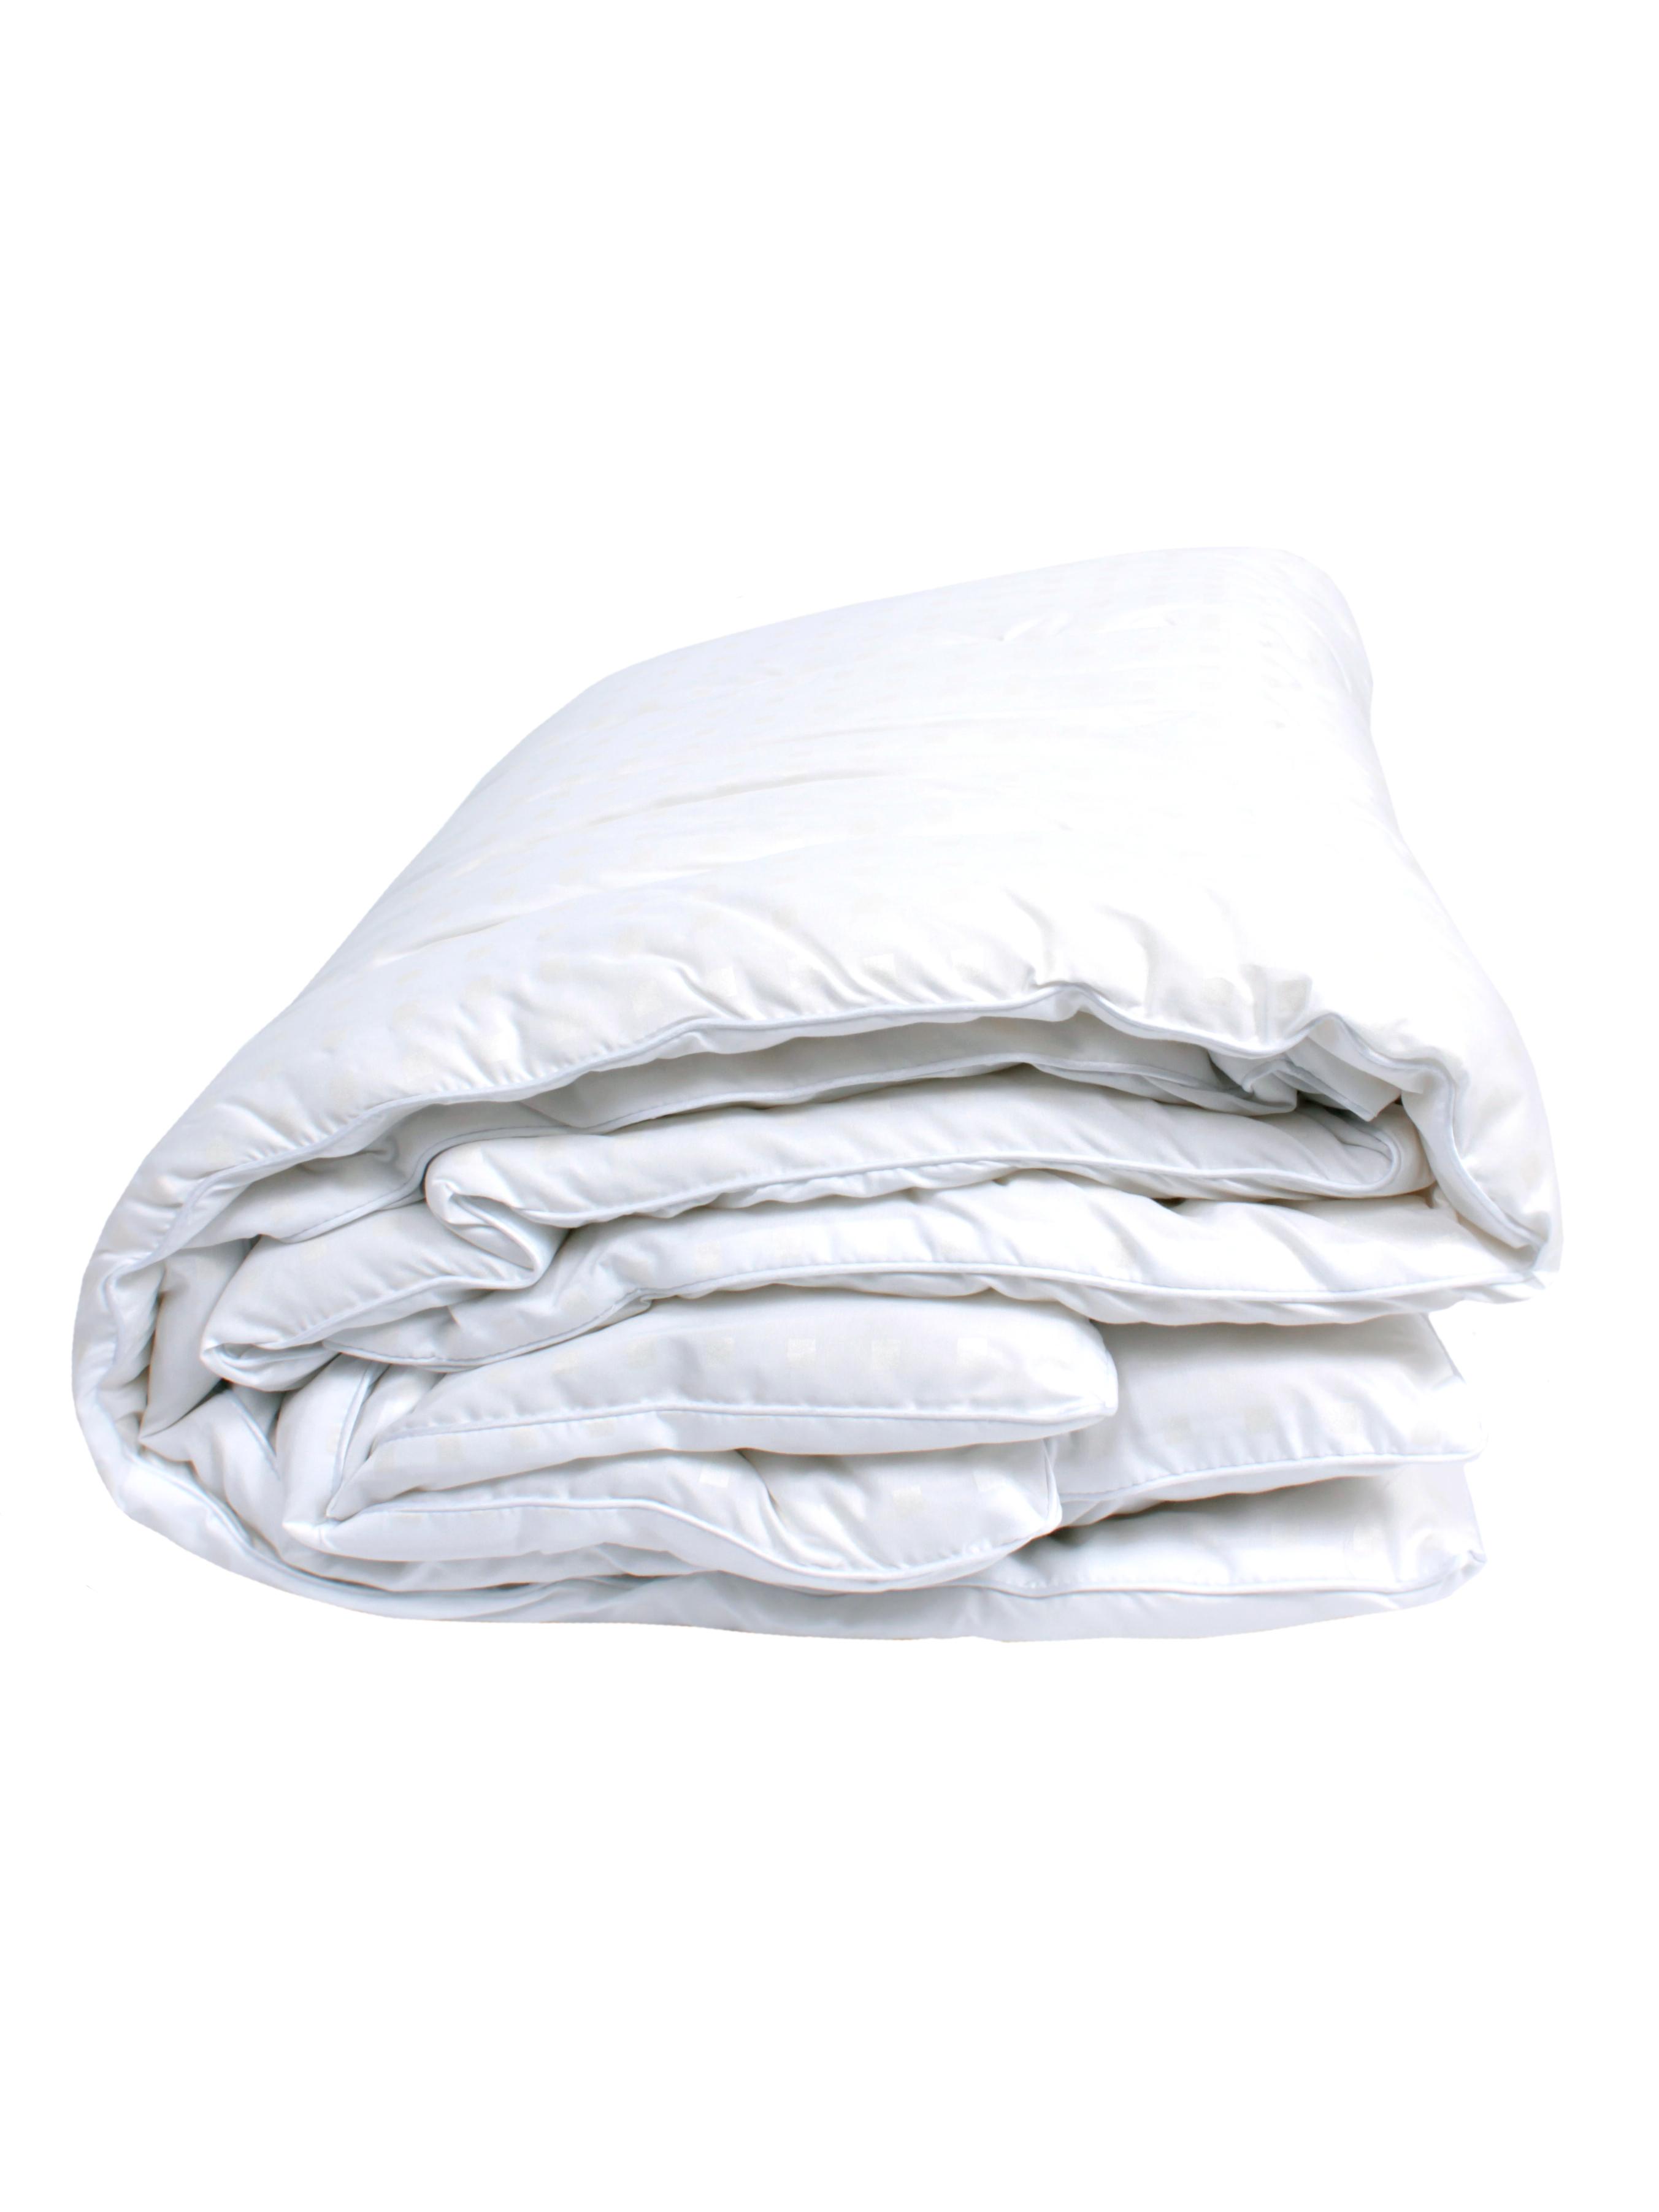 Одеяло легкое SLEEP DELIVERY Евро из искусственного